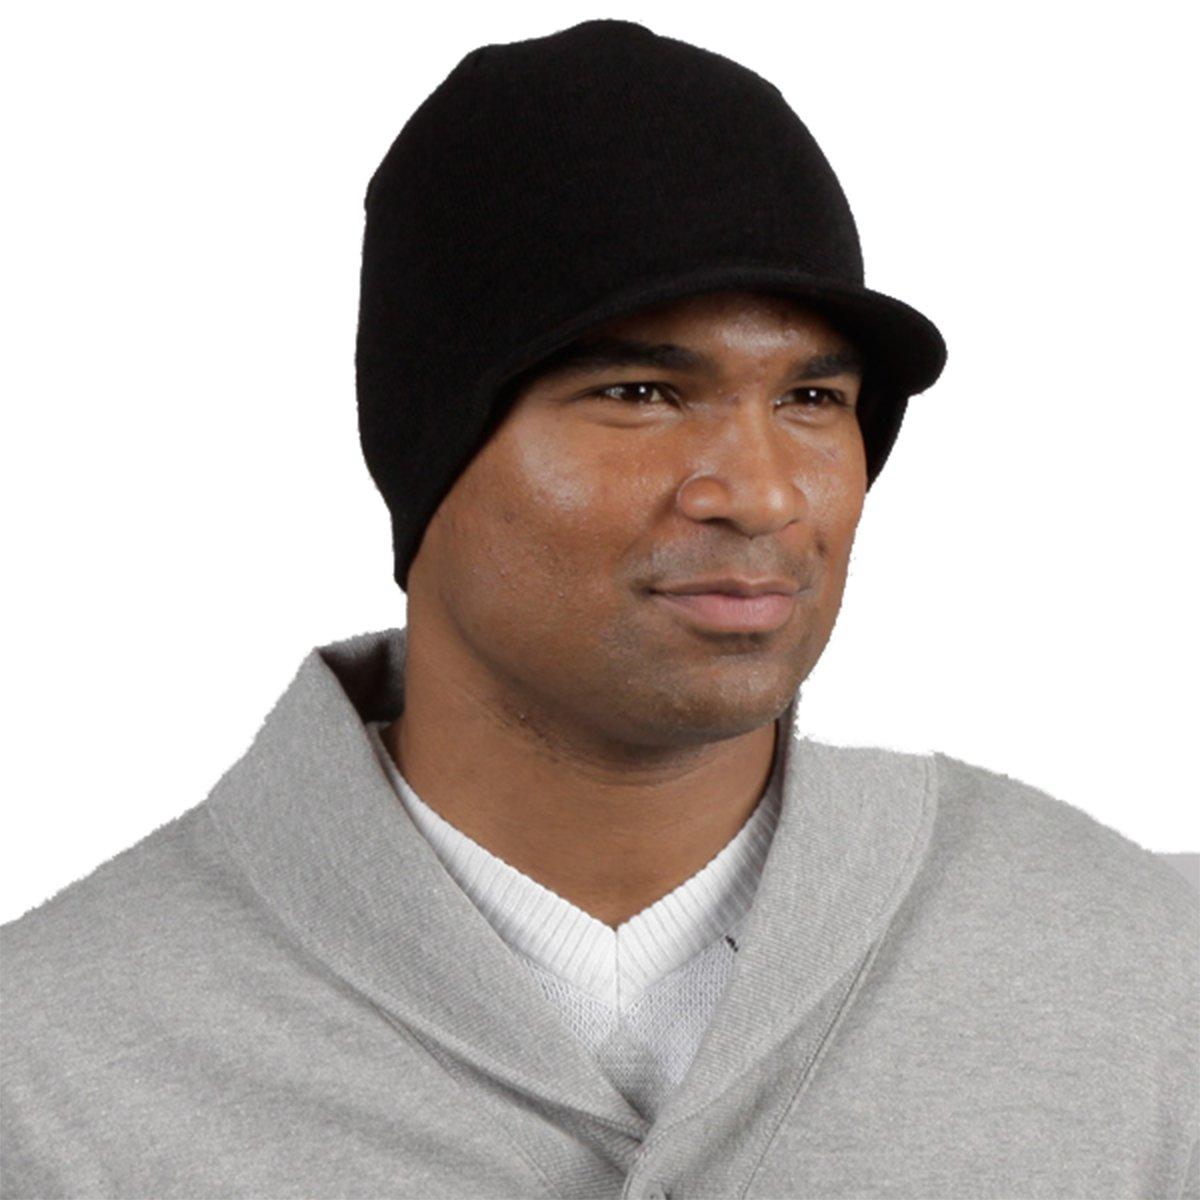 Minus33 Merino Wool Spur Visor Beanie, Black, One Size Minus33 Merino Wool Clothing 603